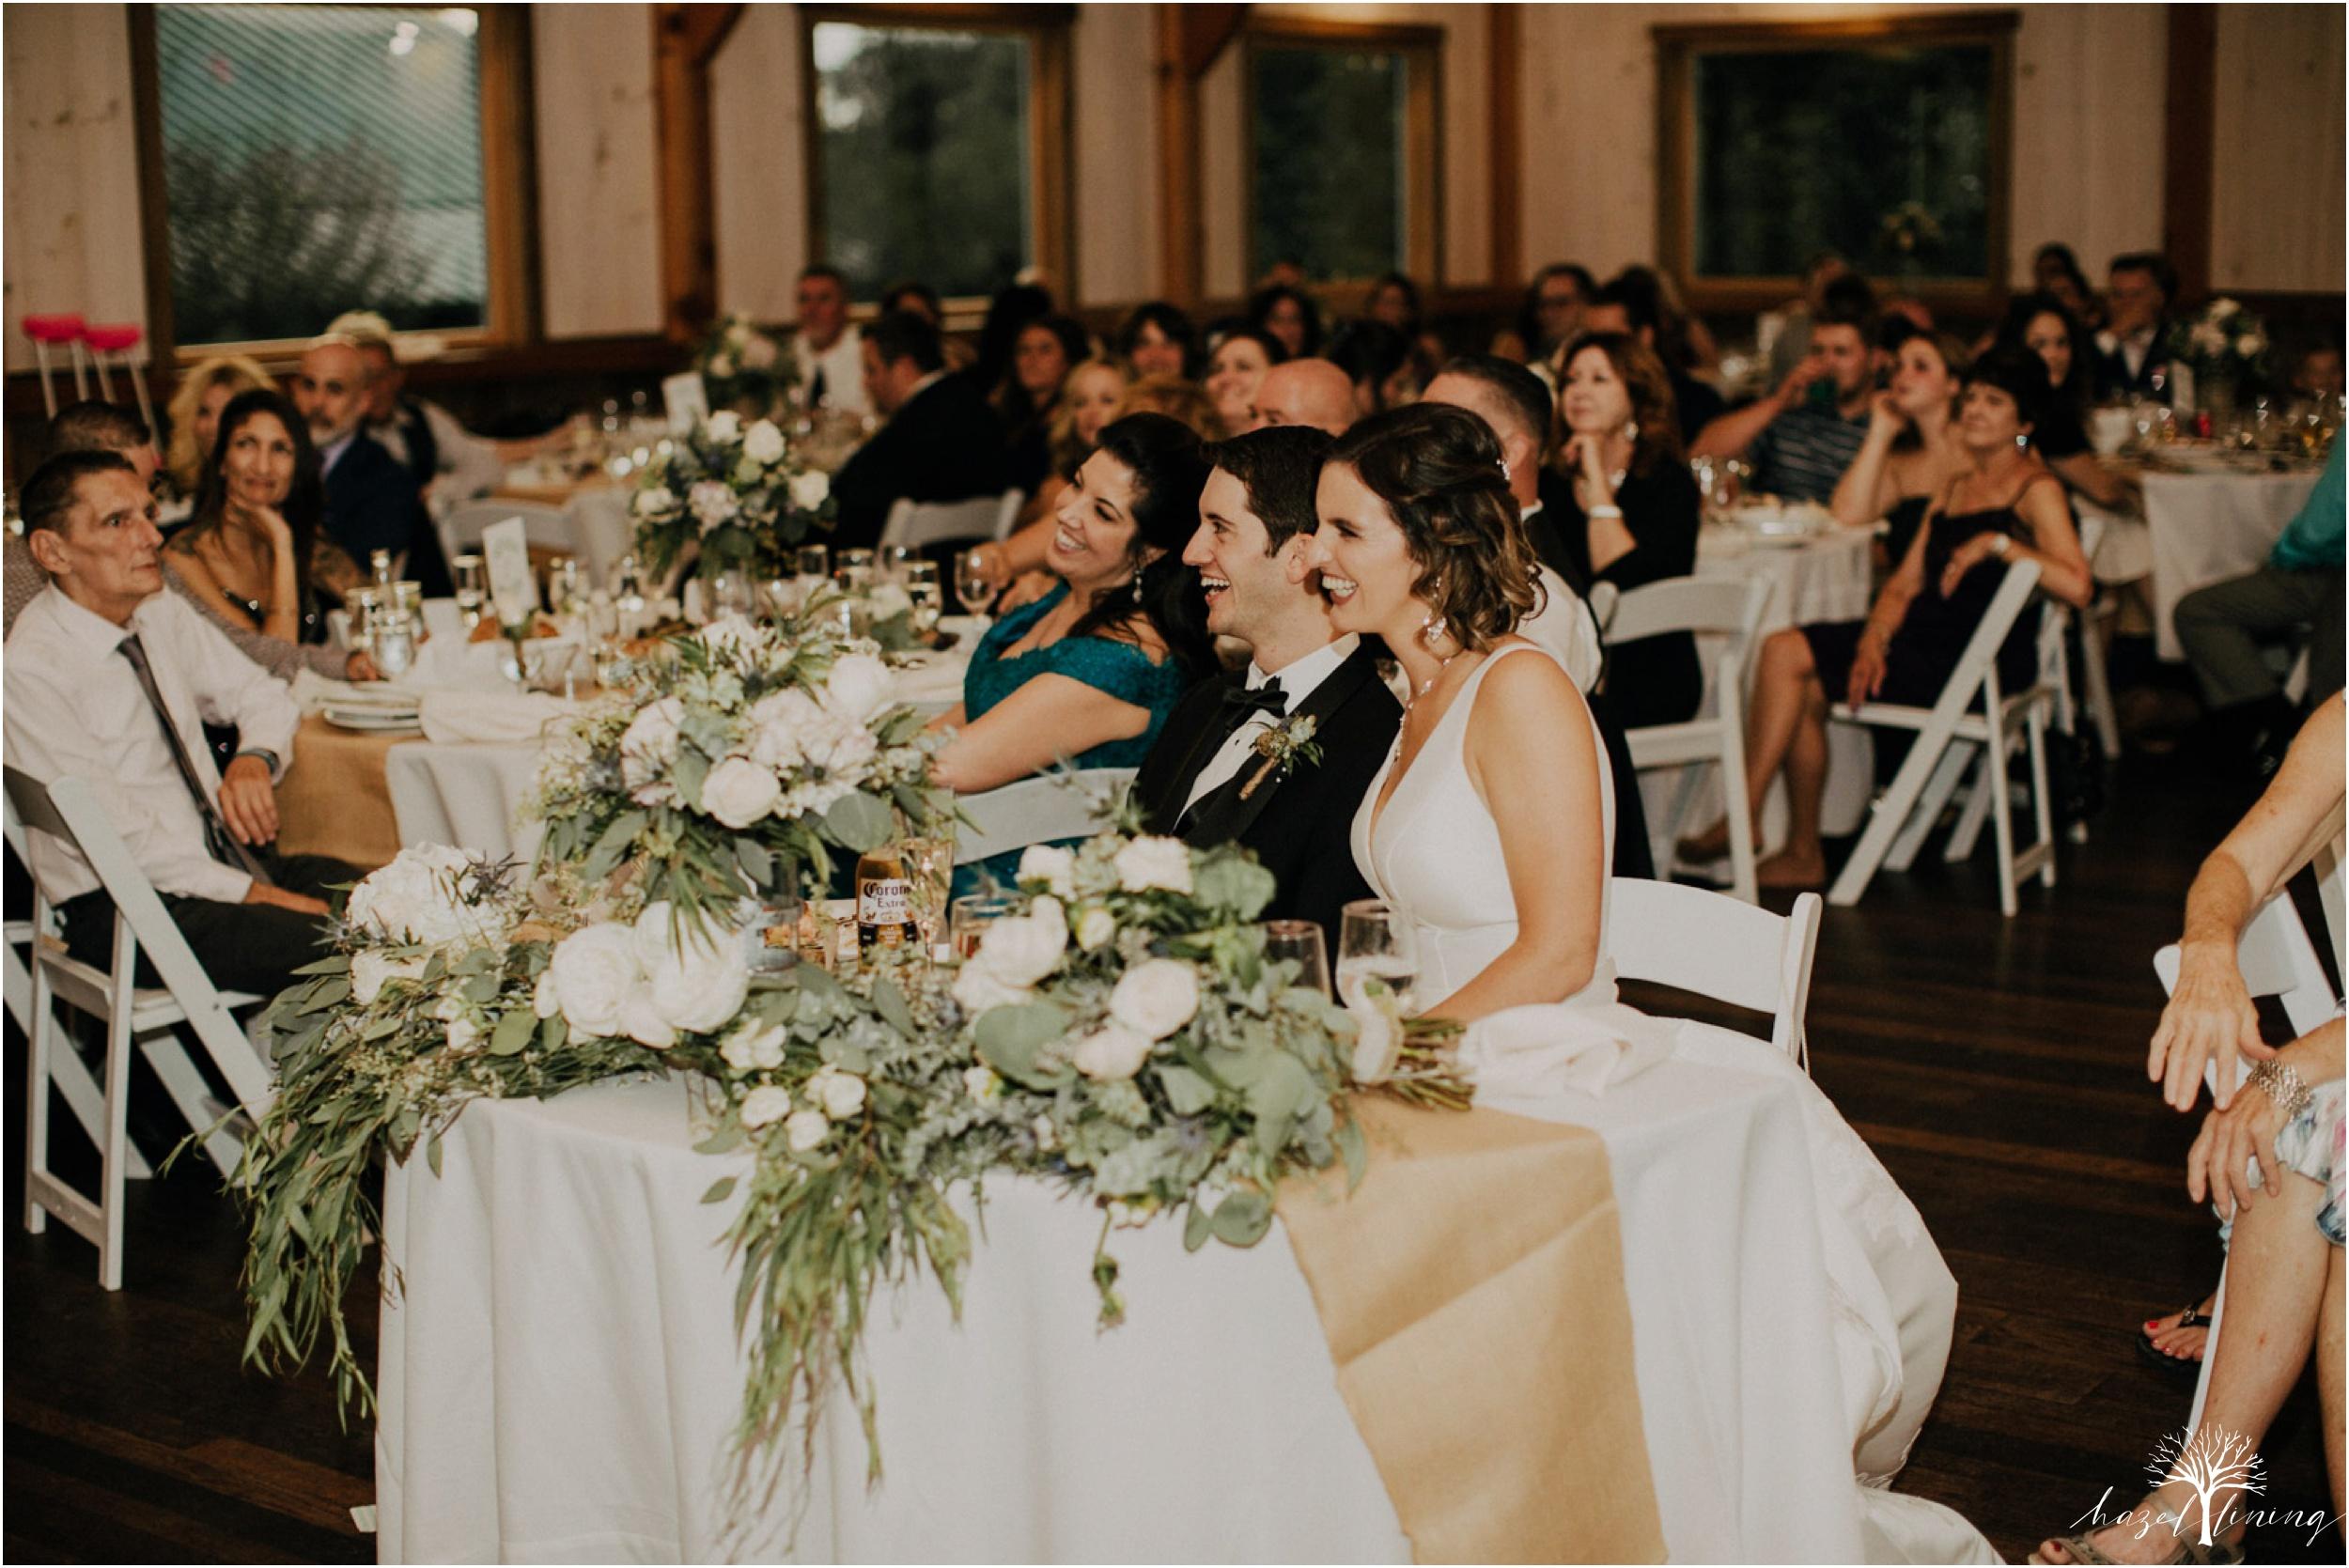 maureen-hepner-anthony-giordano-rose-bank-winery-newtow-pennsylvania-luxury-summer-wedding-hazel-lining-photography-destination-elopement-wedding-engagement-photography_0142.jpg